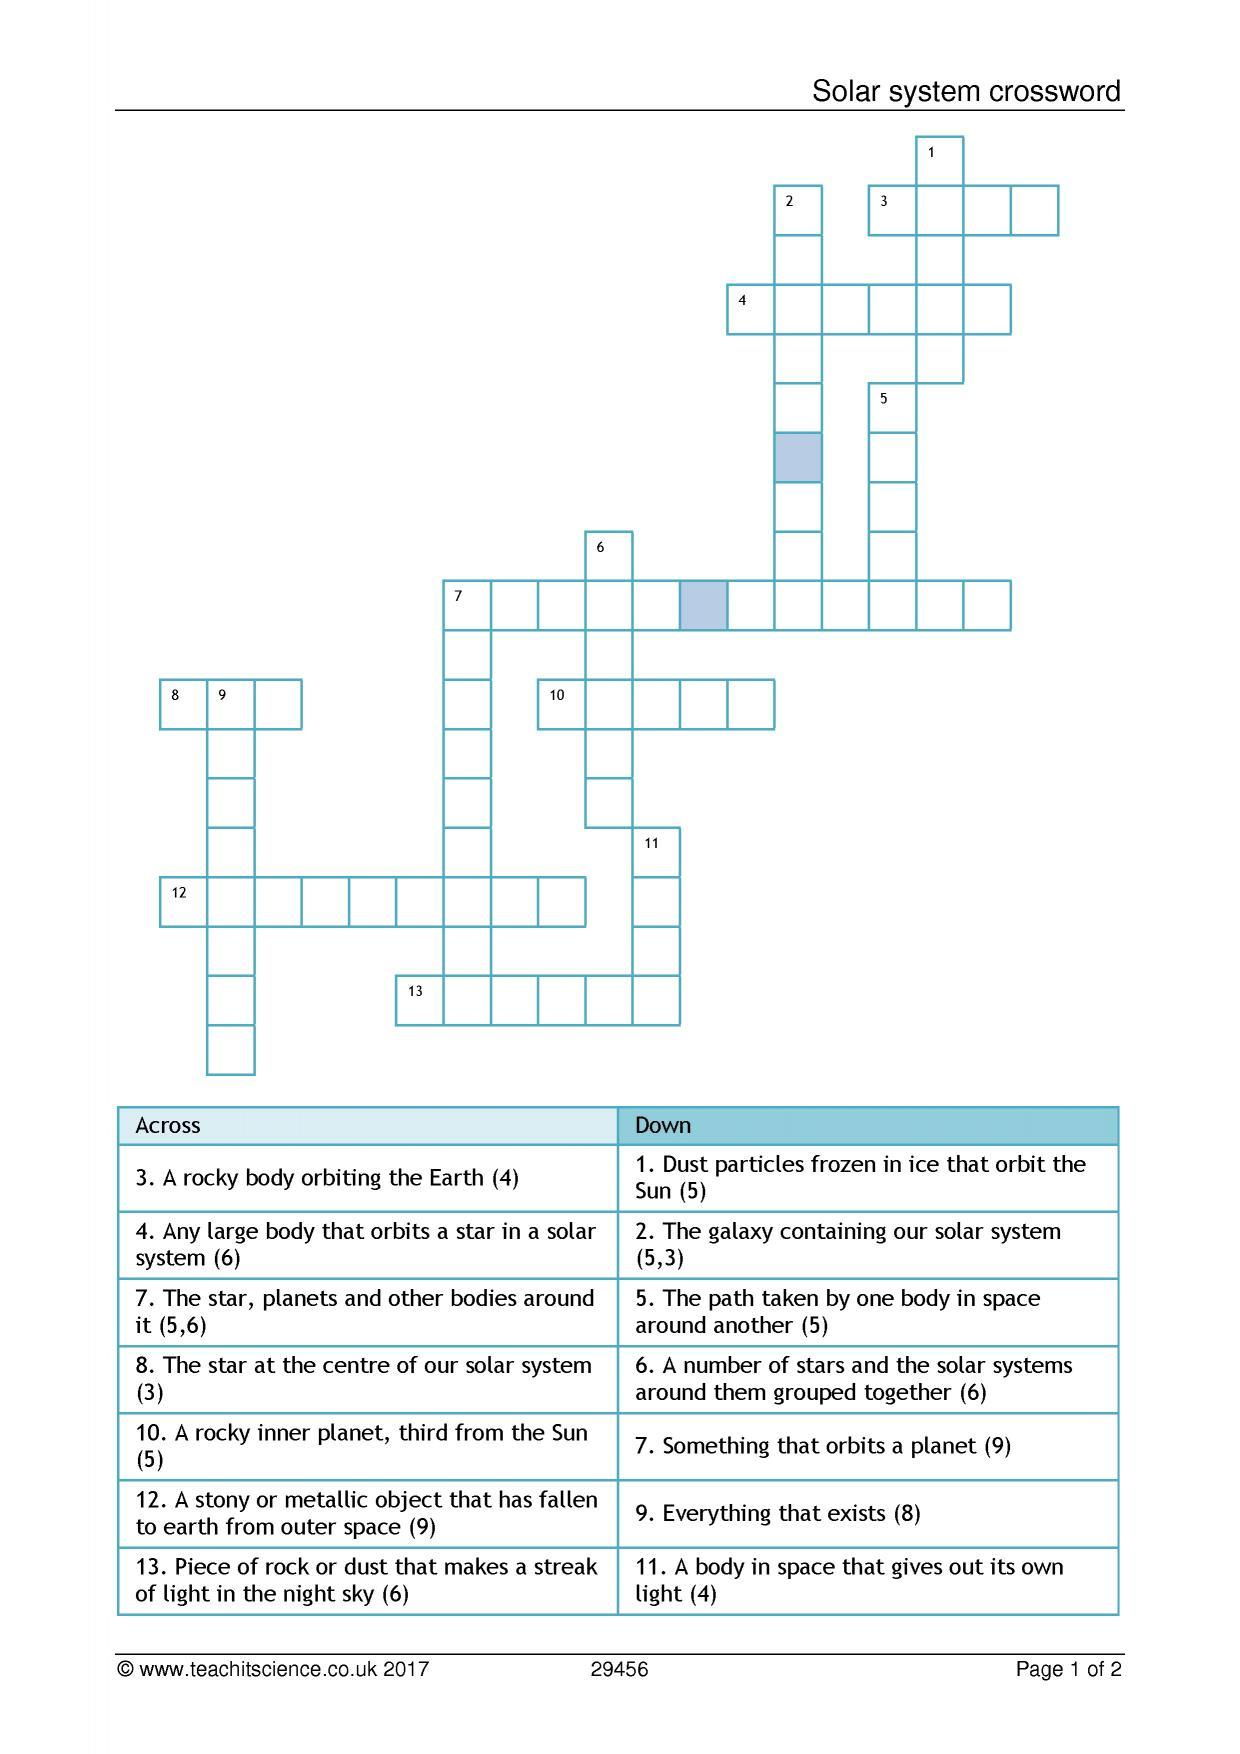 Solar System Crossword